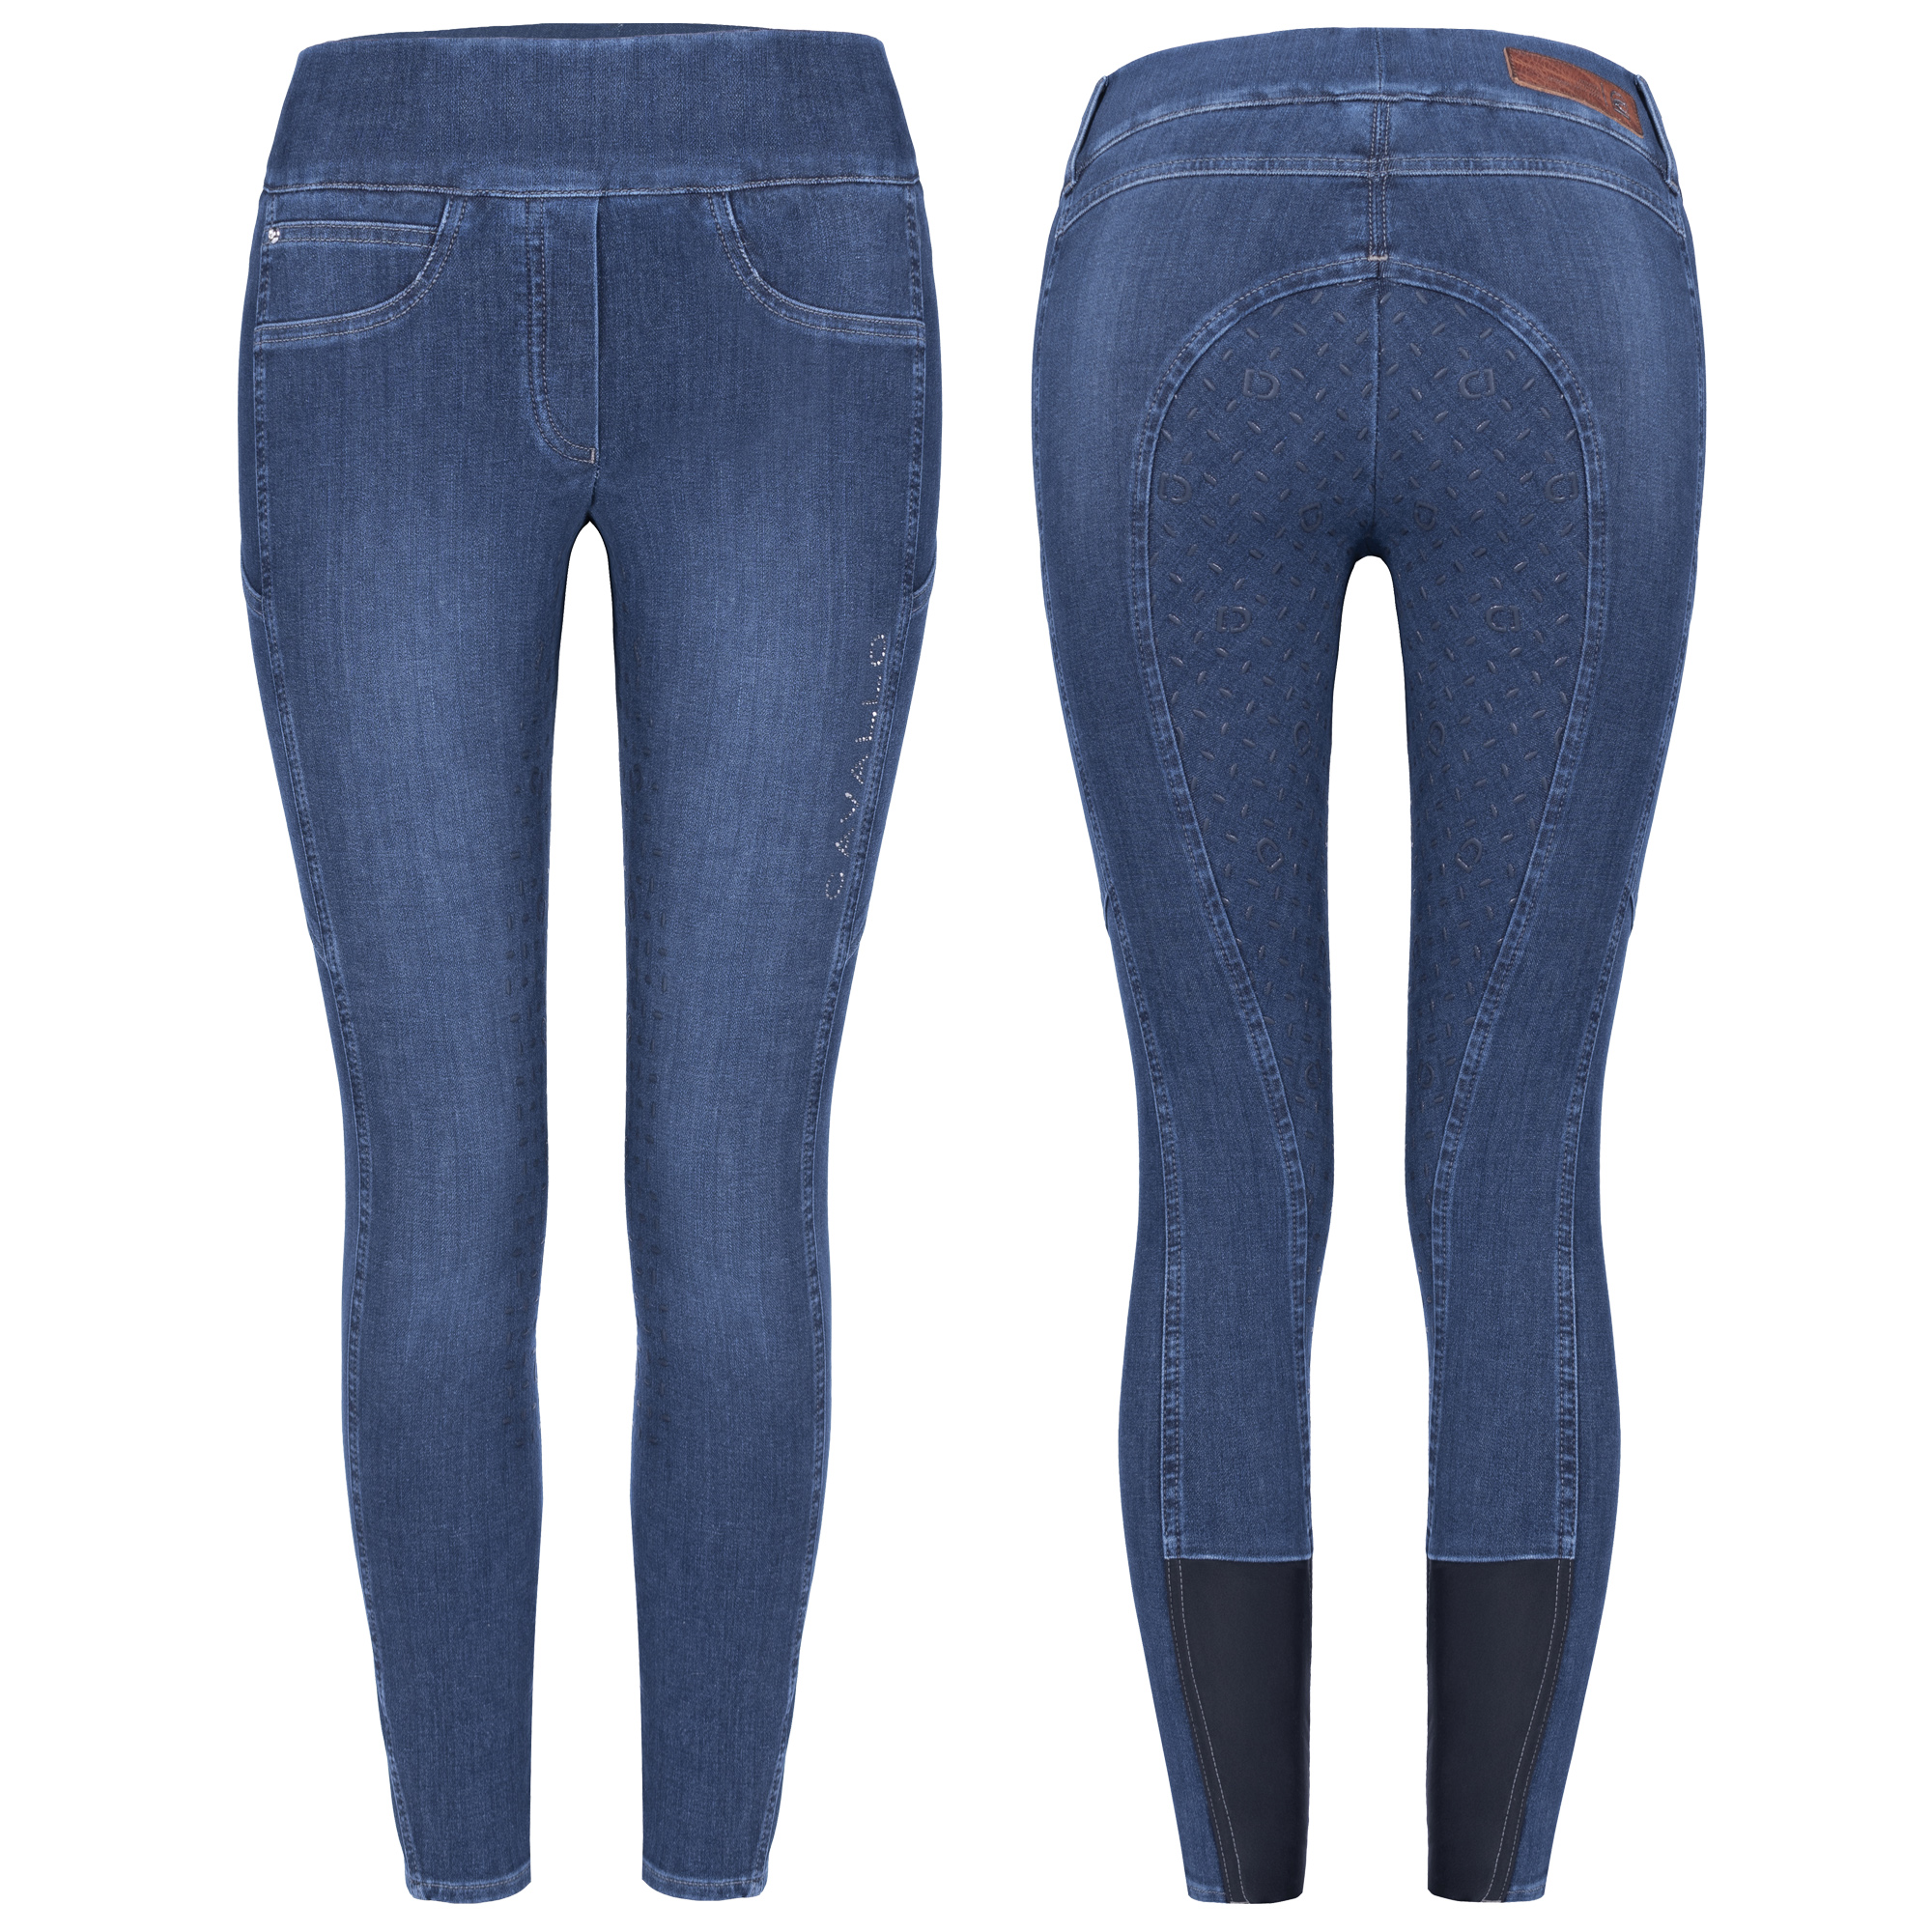 Cavallo Damenreithose Reitleggings CARLY Grip in blue washed